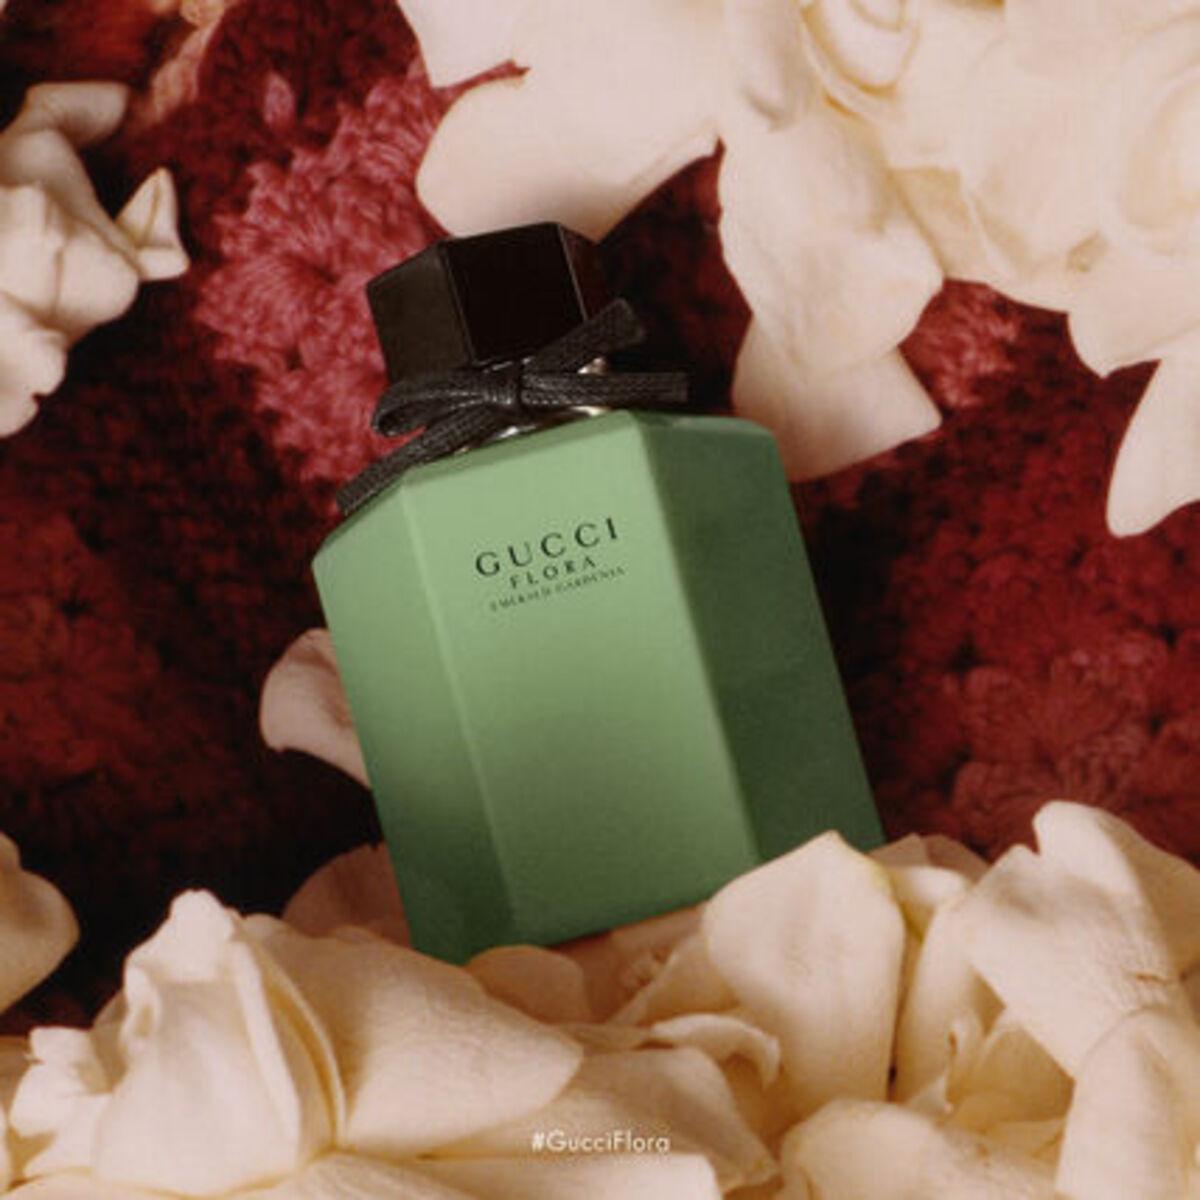 Bild 4 von Gucci Flora Emerald Gardenia, Eau de Toilette